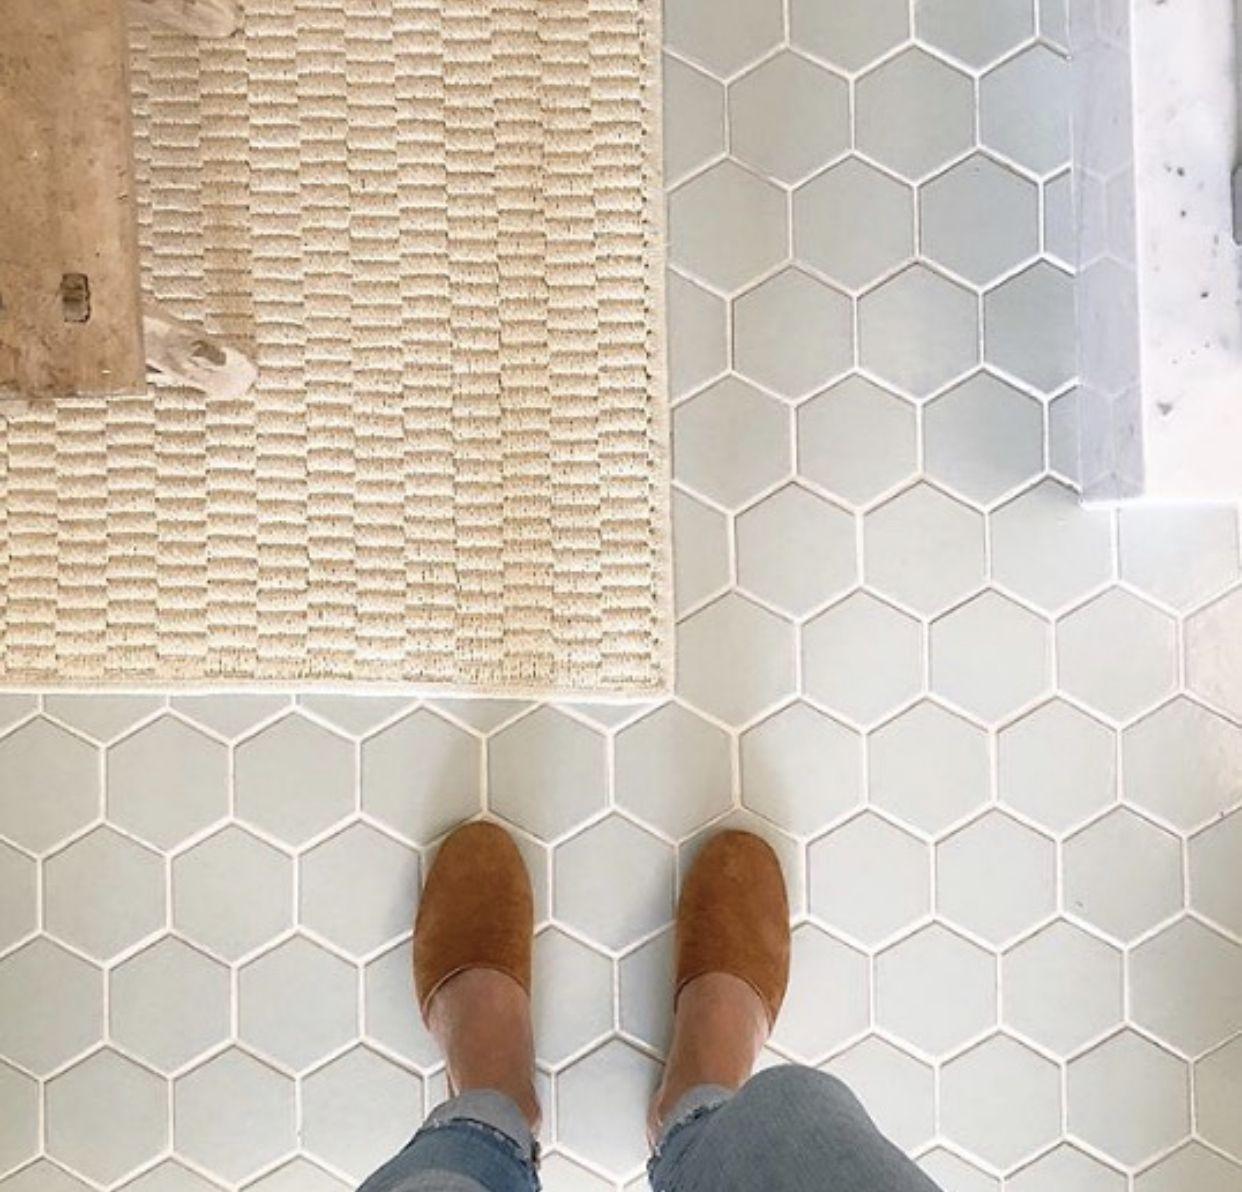 Pin By Anna Wade On Bathrooms Hexagon Tile Bathroom Floor Fireclay Tile Honeycomb Tiles Bathroom